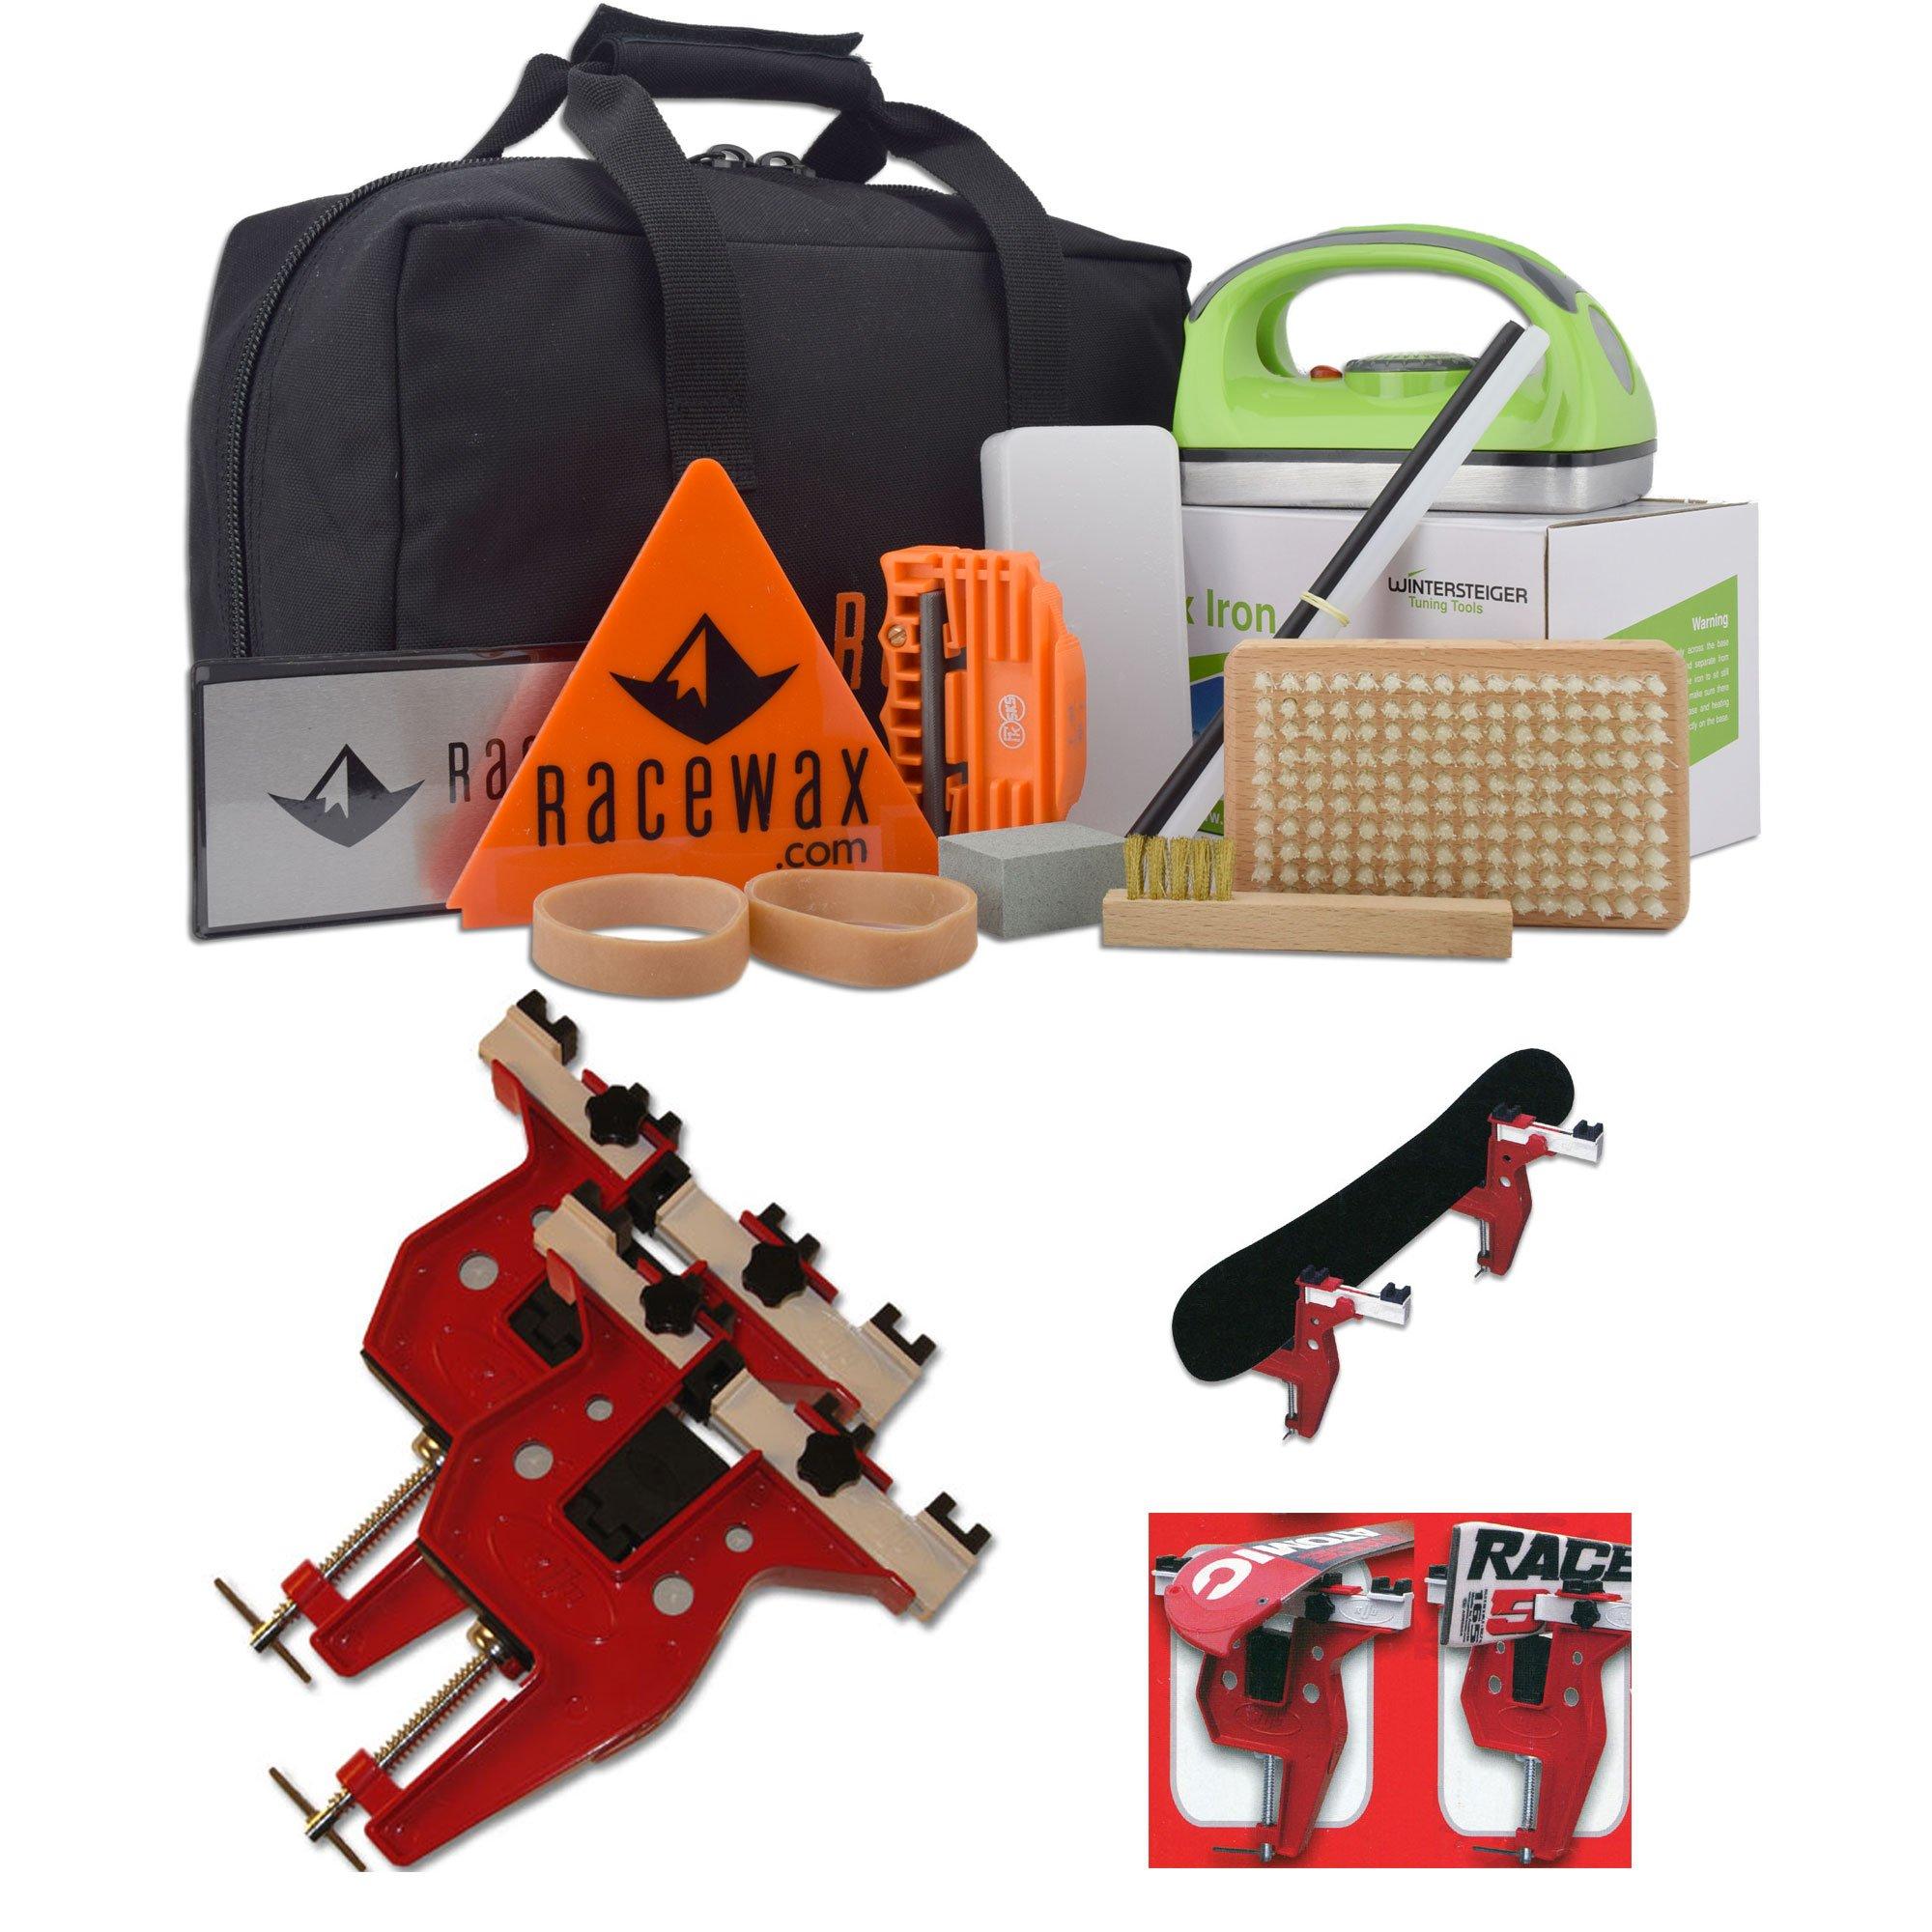 RaceWax Carver Ski Snowboard Wax Tuning Kit Plus Snowboard/Ski Combo Vise by RaceWax